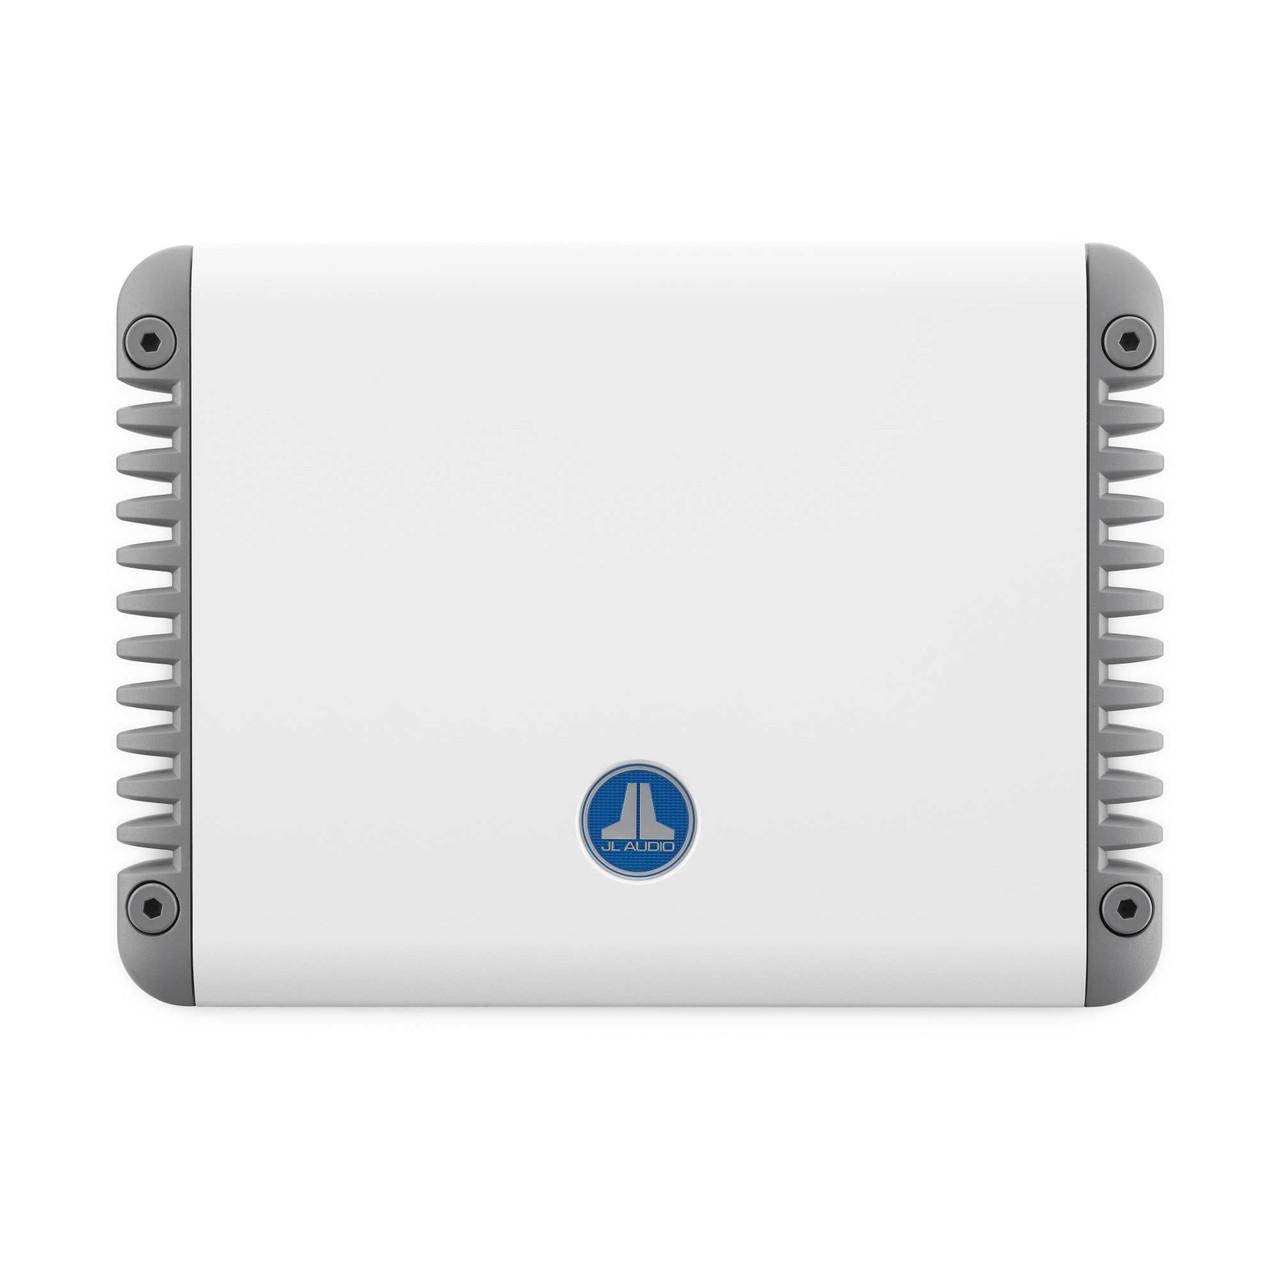 Jl Audio Refurbished Mhd600 4 Ch Class D Full Range Marine Need Help Wiring Kicker Cvr 12 Diyaudio Amplifier 600 W Creative